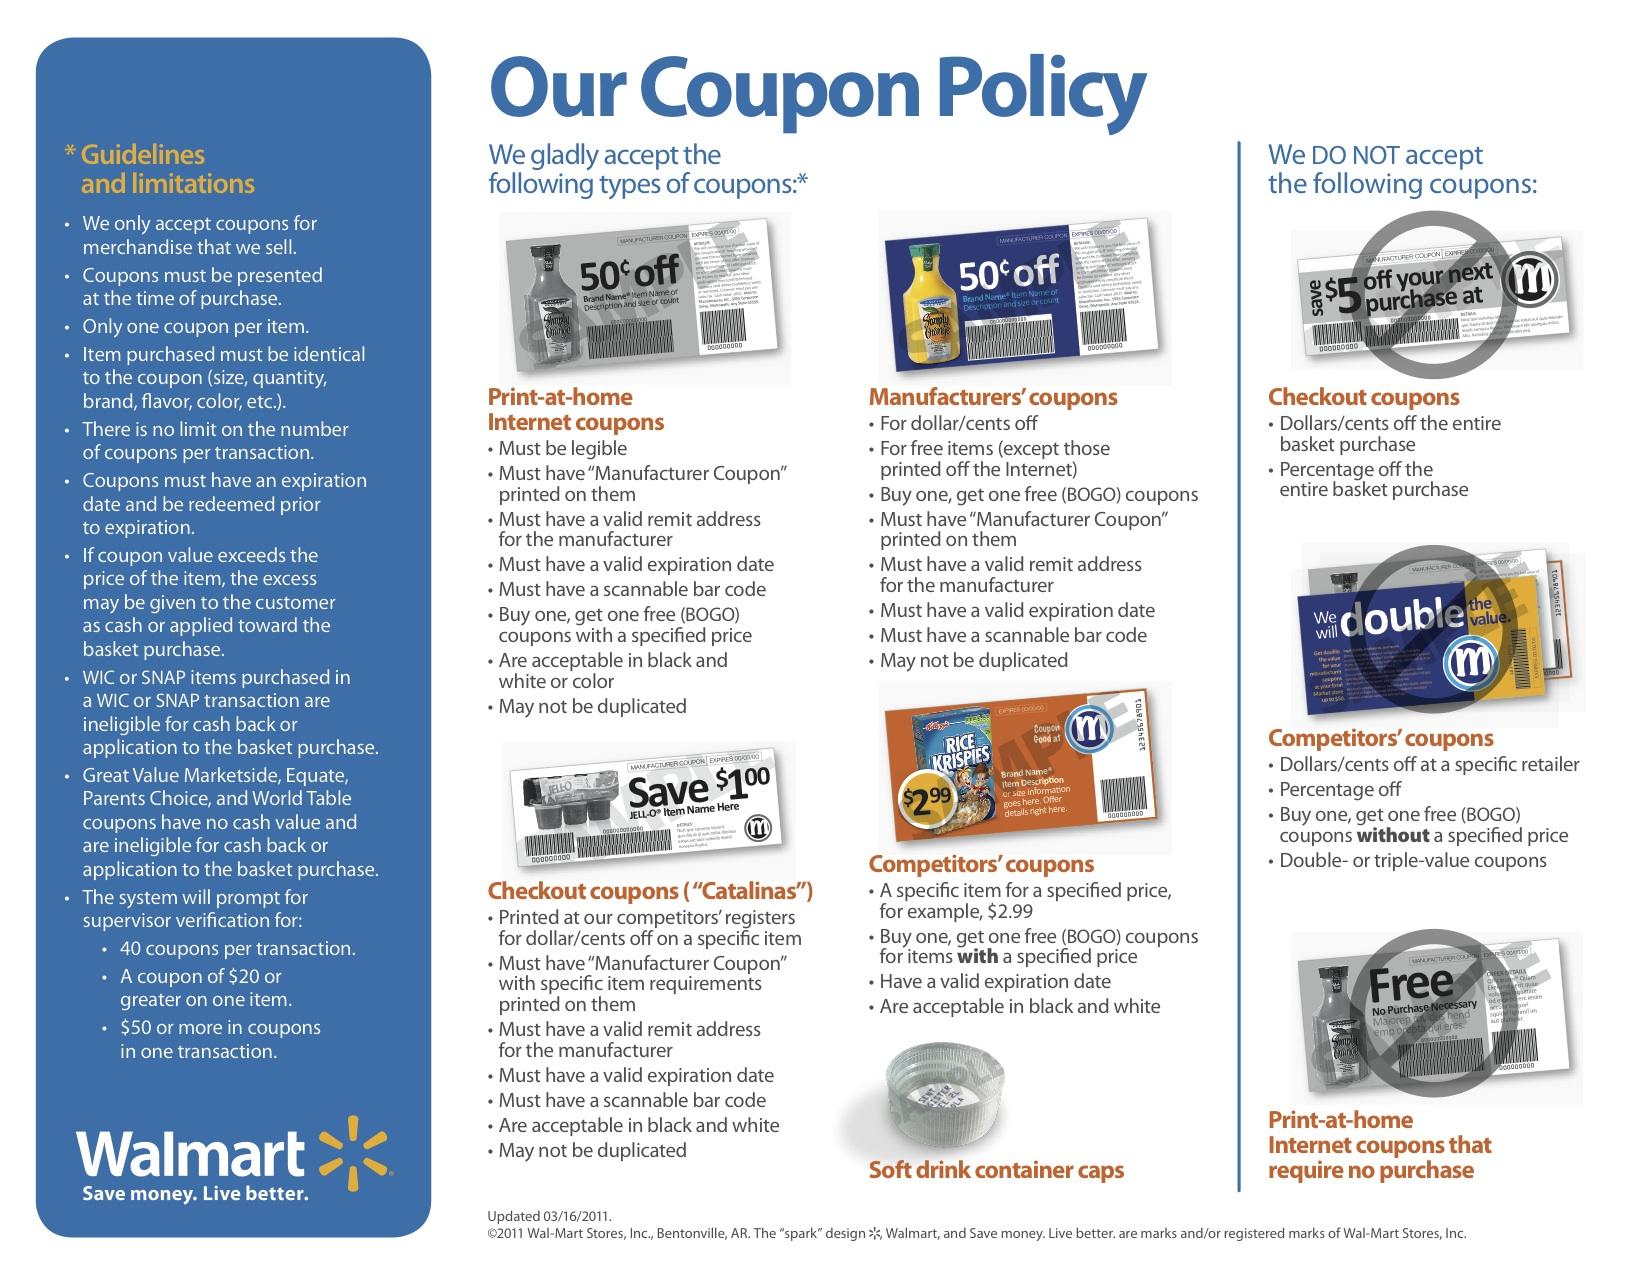 Nevada walmart coupon policy